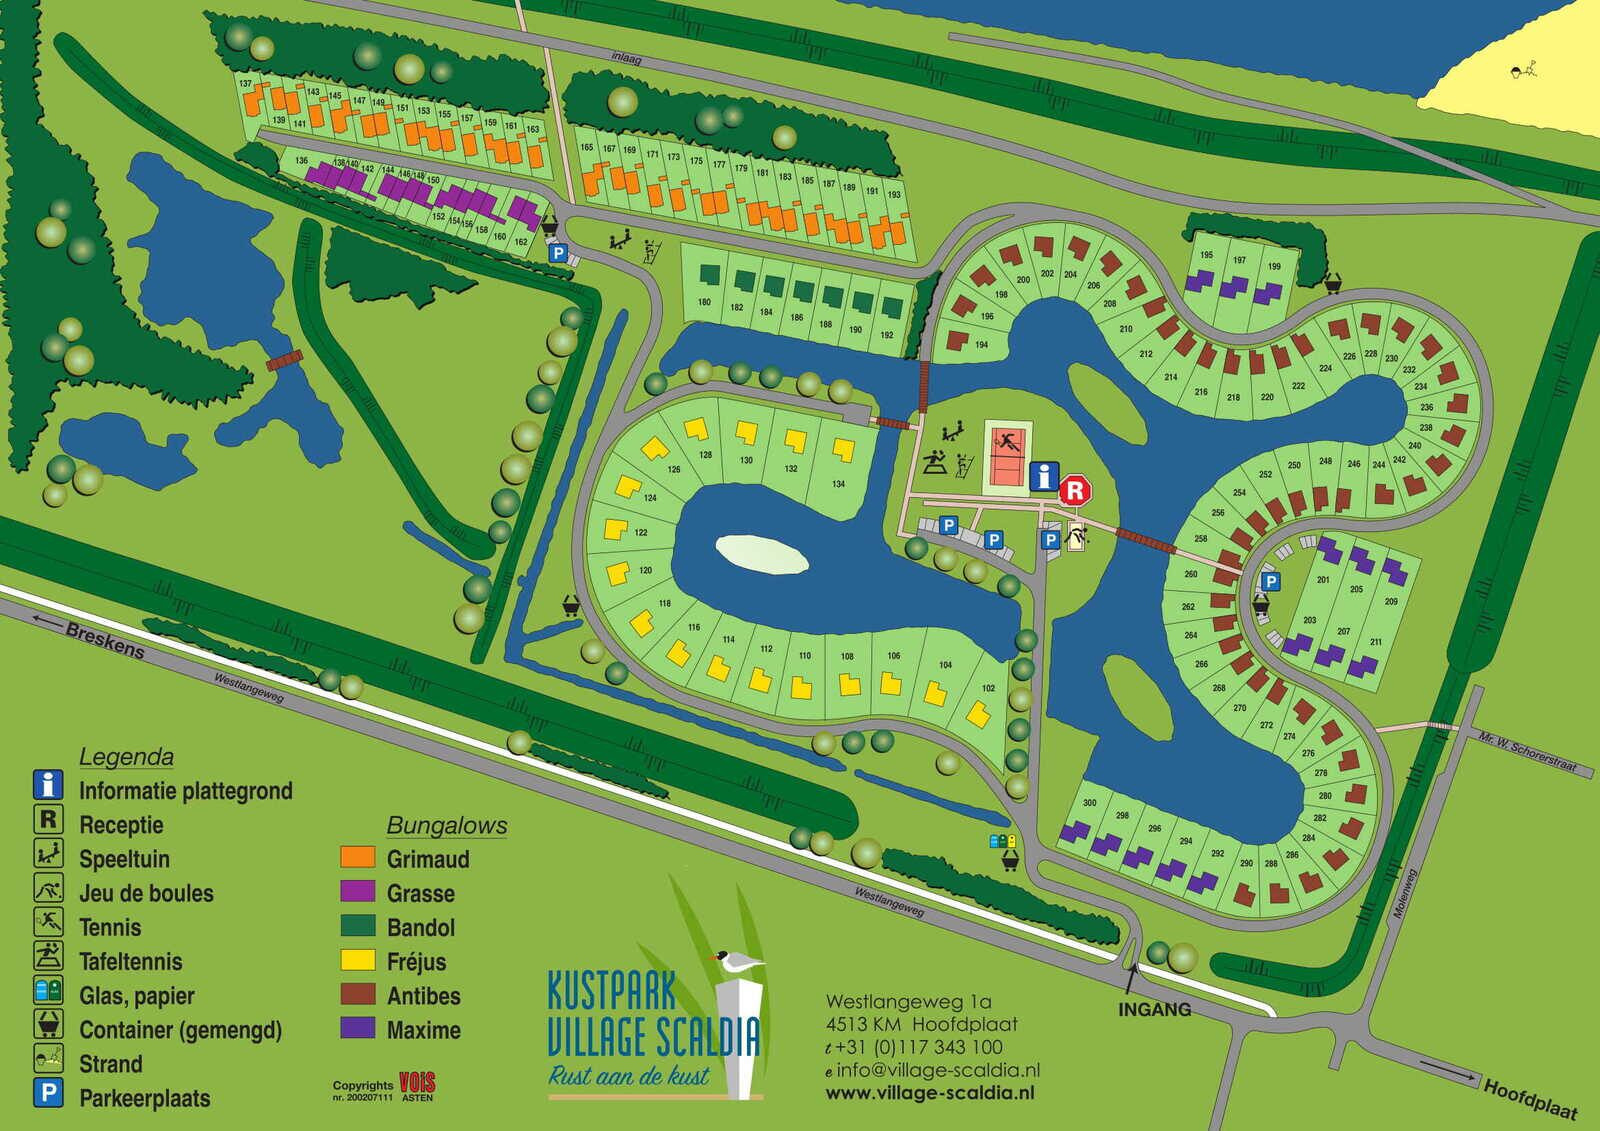 Antibes 256 - Kustpark Village Scaldia